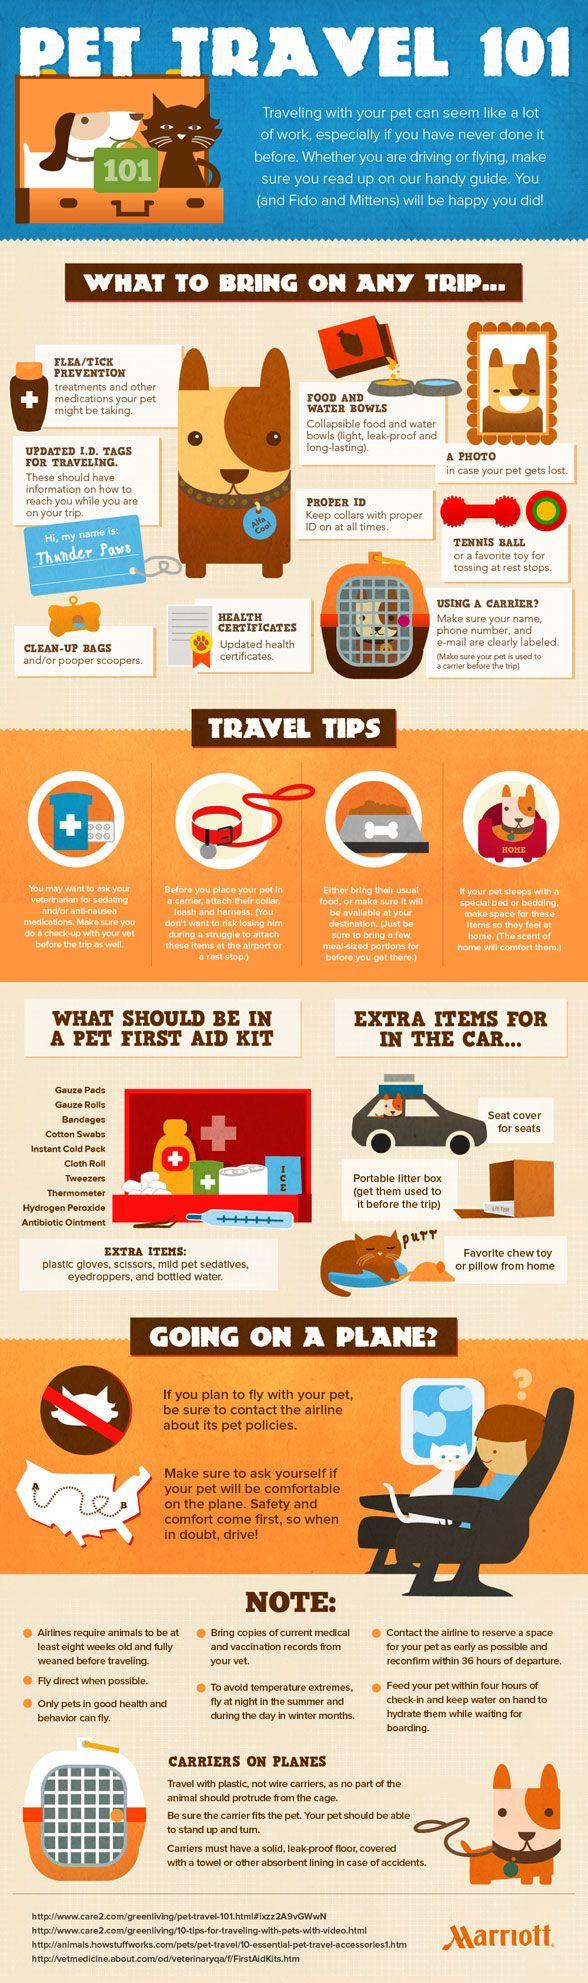 Preparing for Pet Travel | DogTipper.com